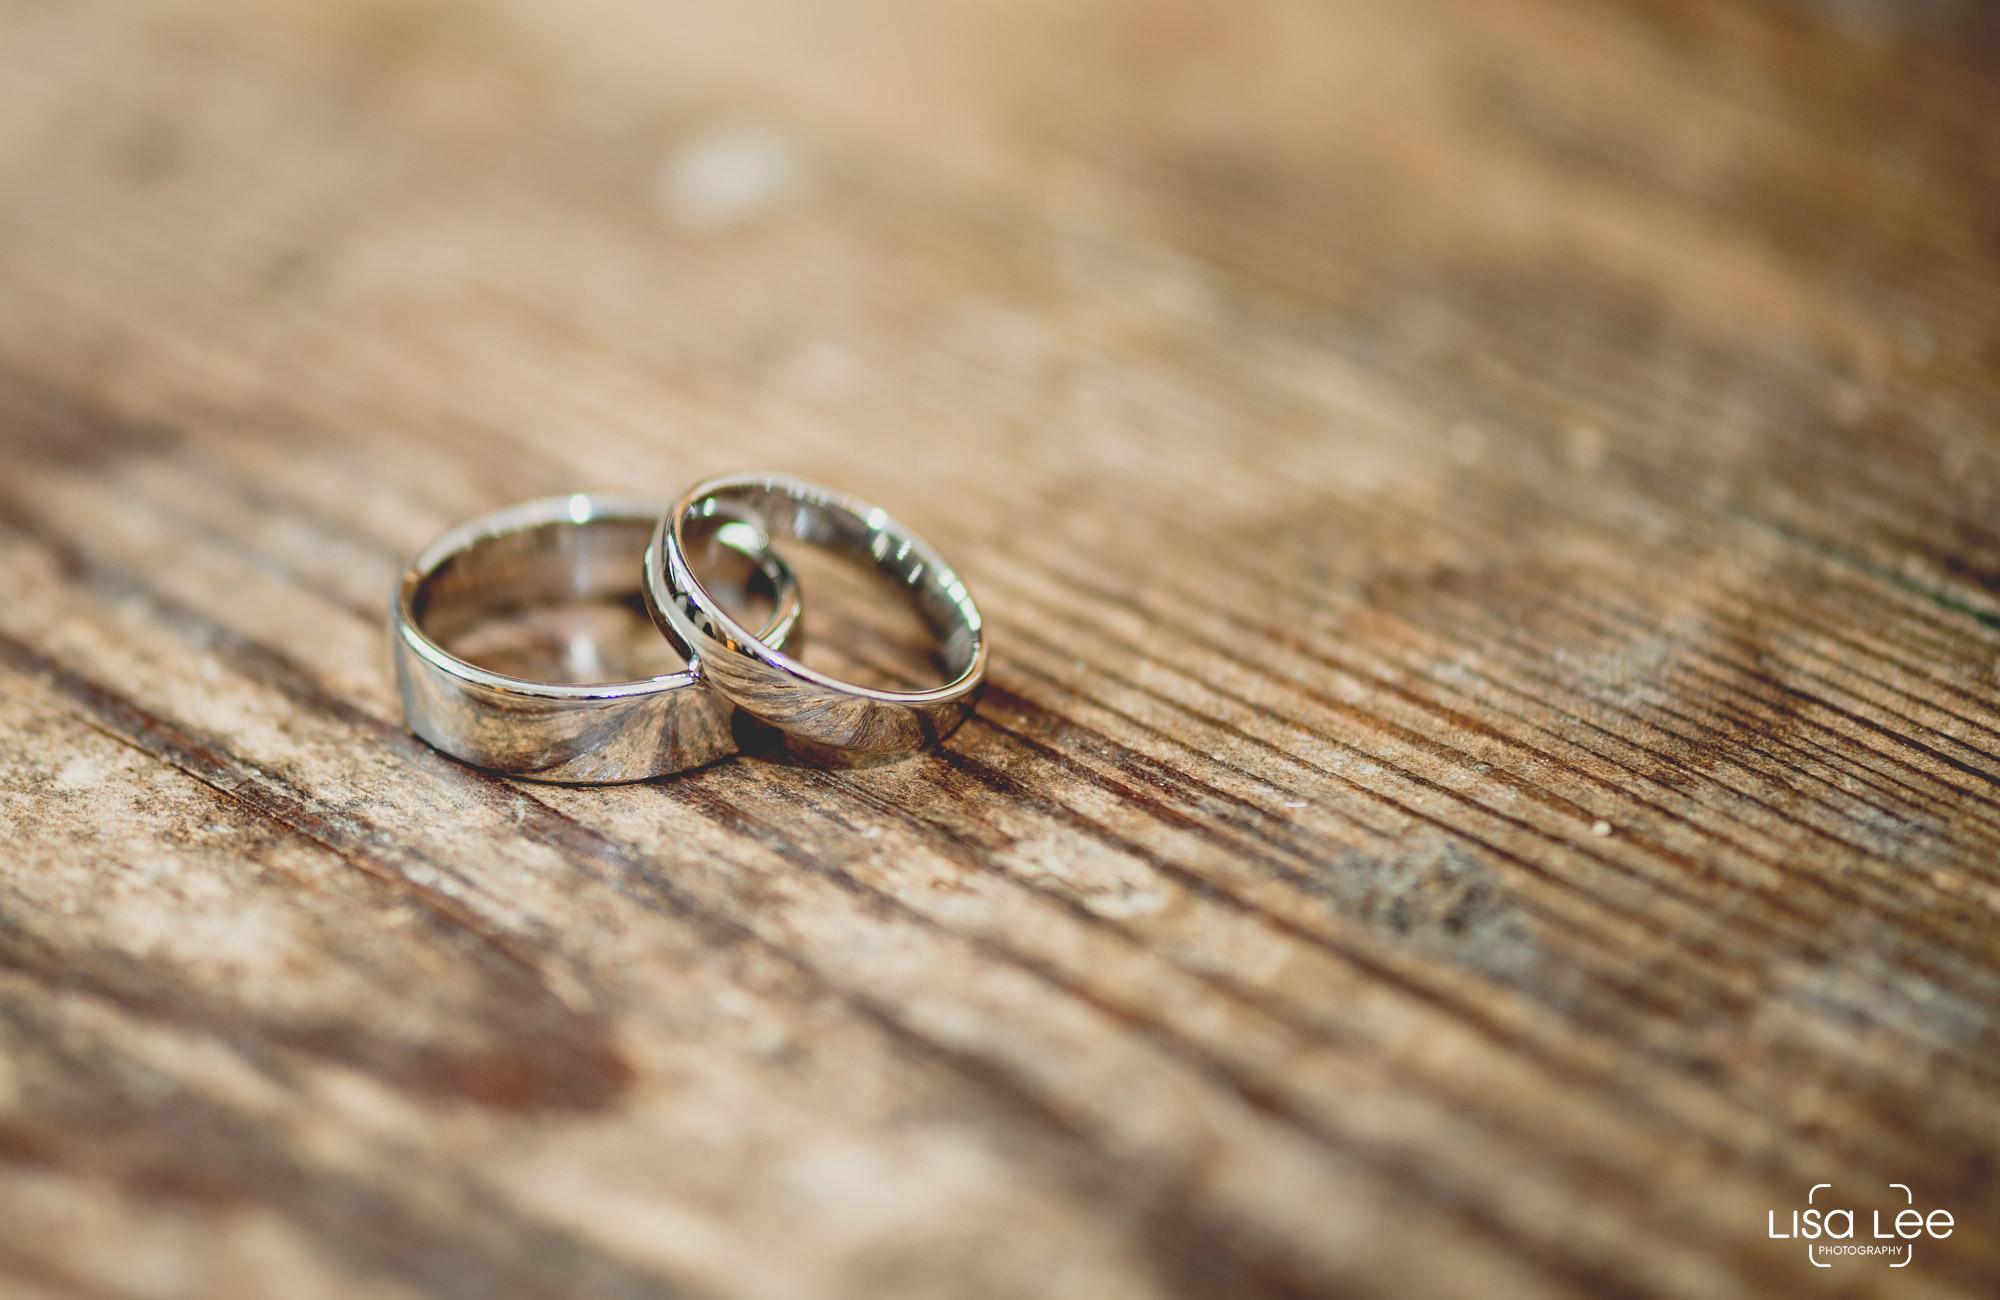 lisa-lee-wedding-photography-rings.jpg